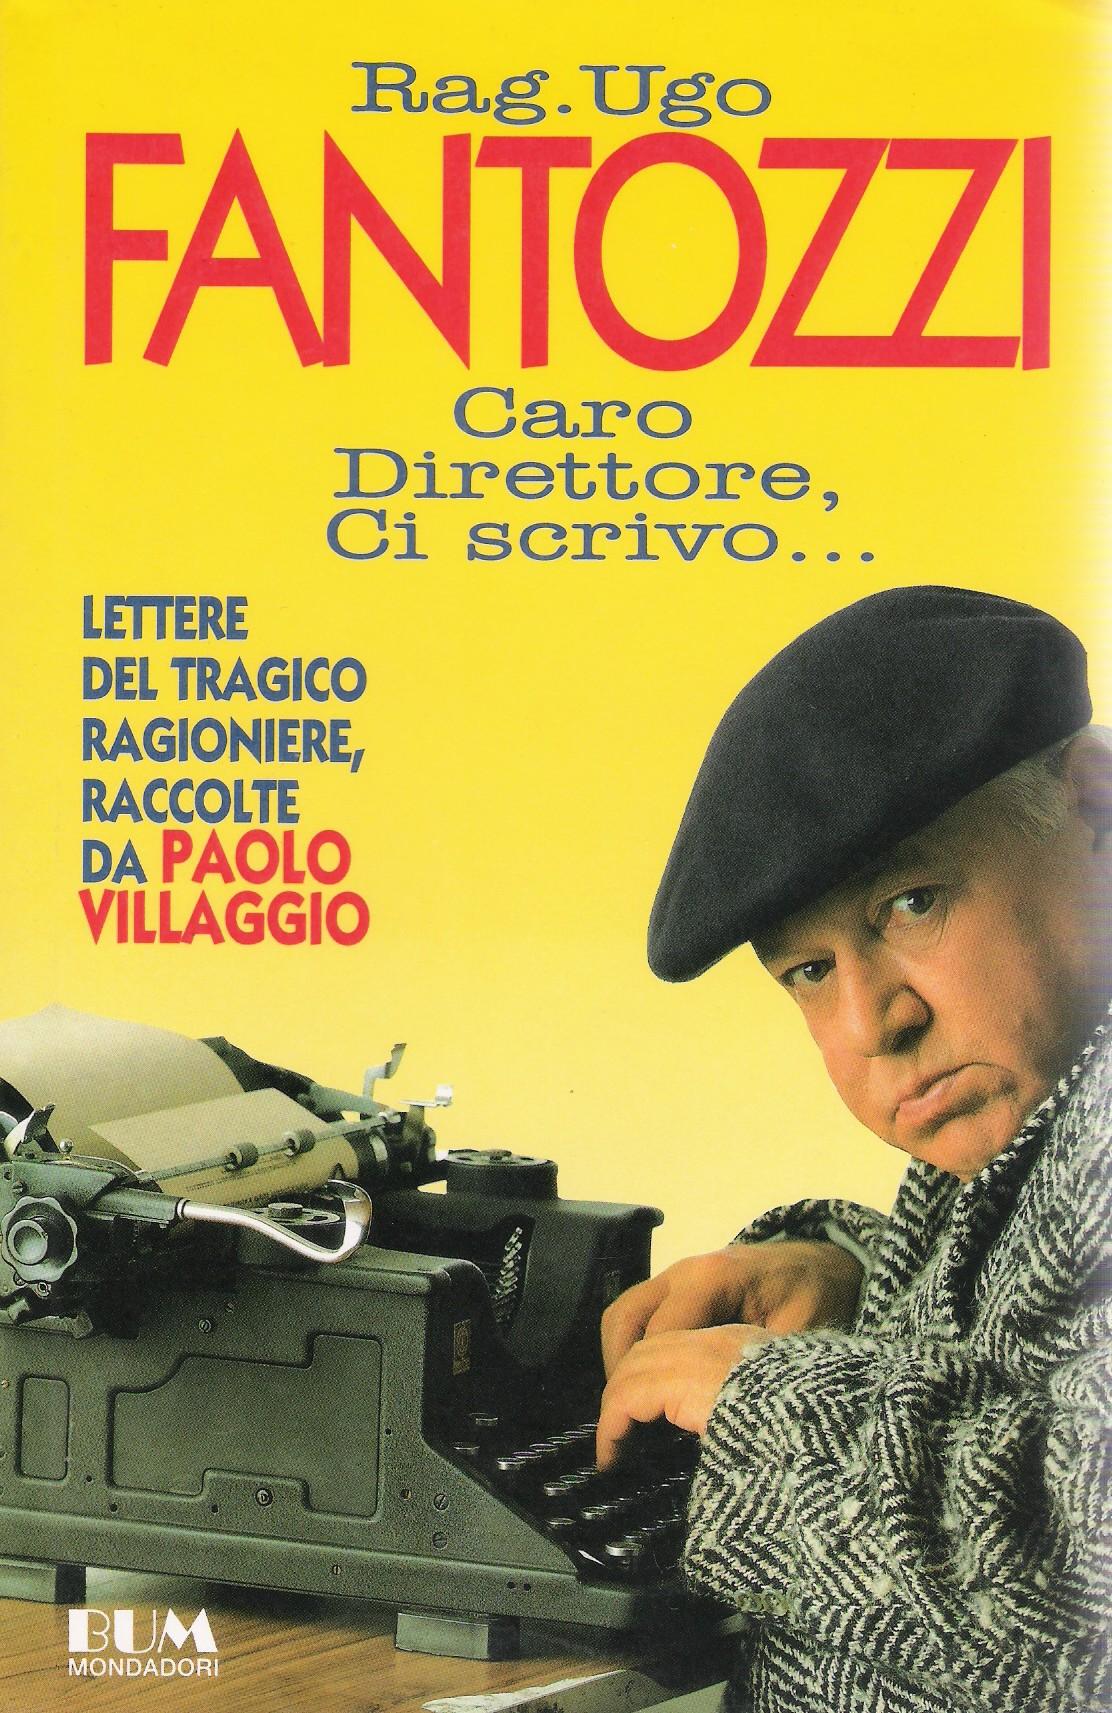 Rag. Ugo Fantozzi